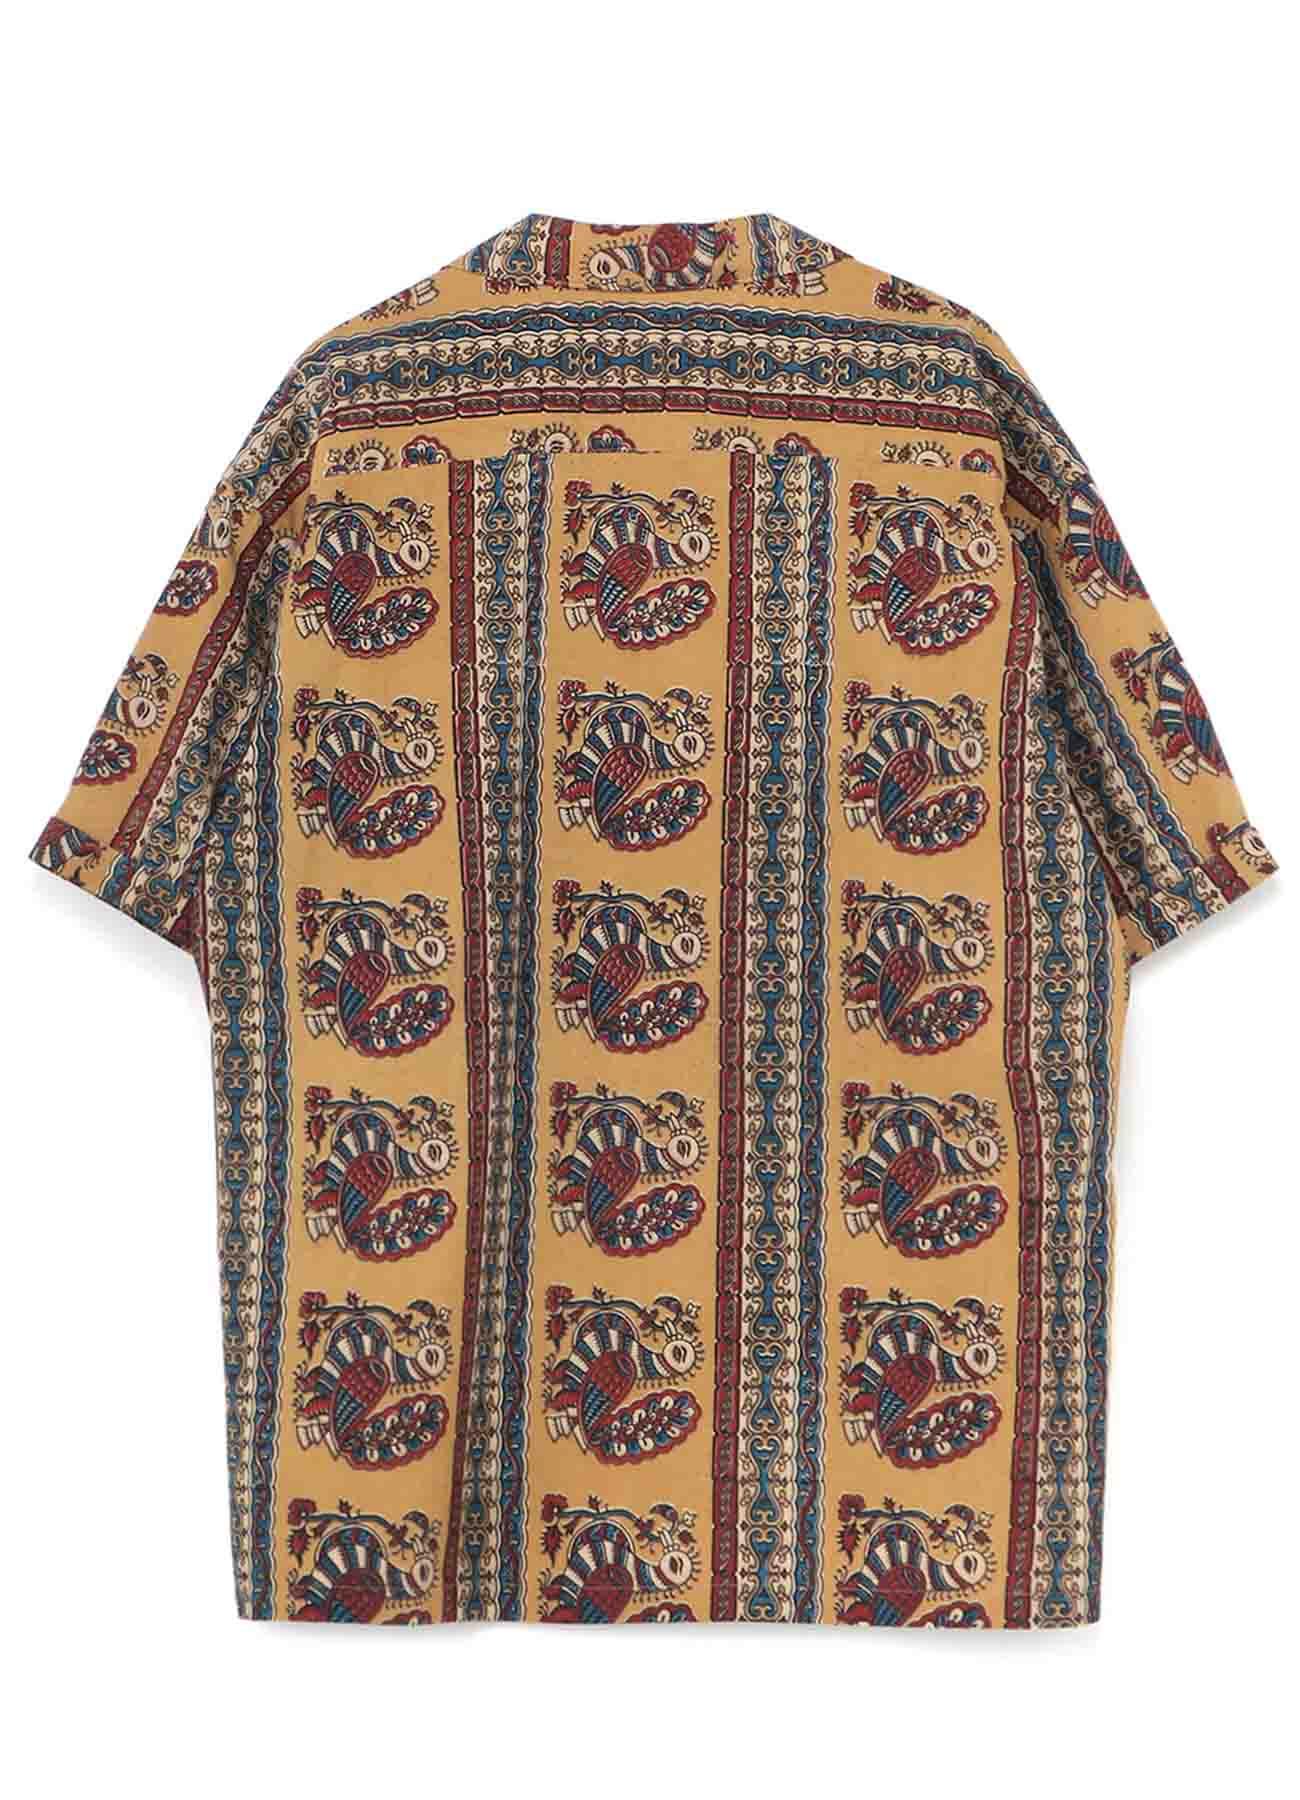 Indian Block Print Peacock Big Short Sleeve Shirt